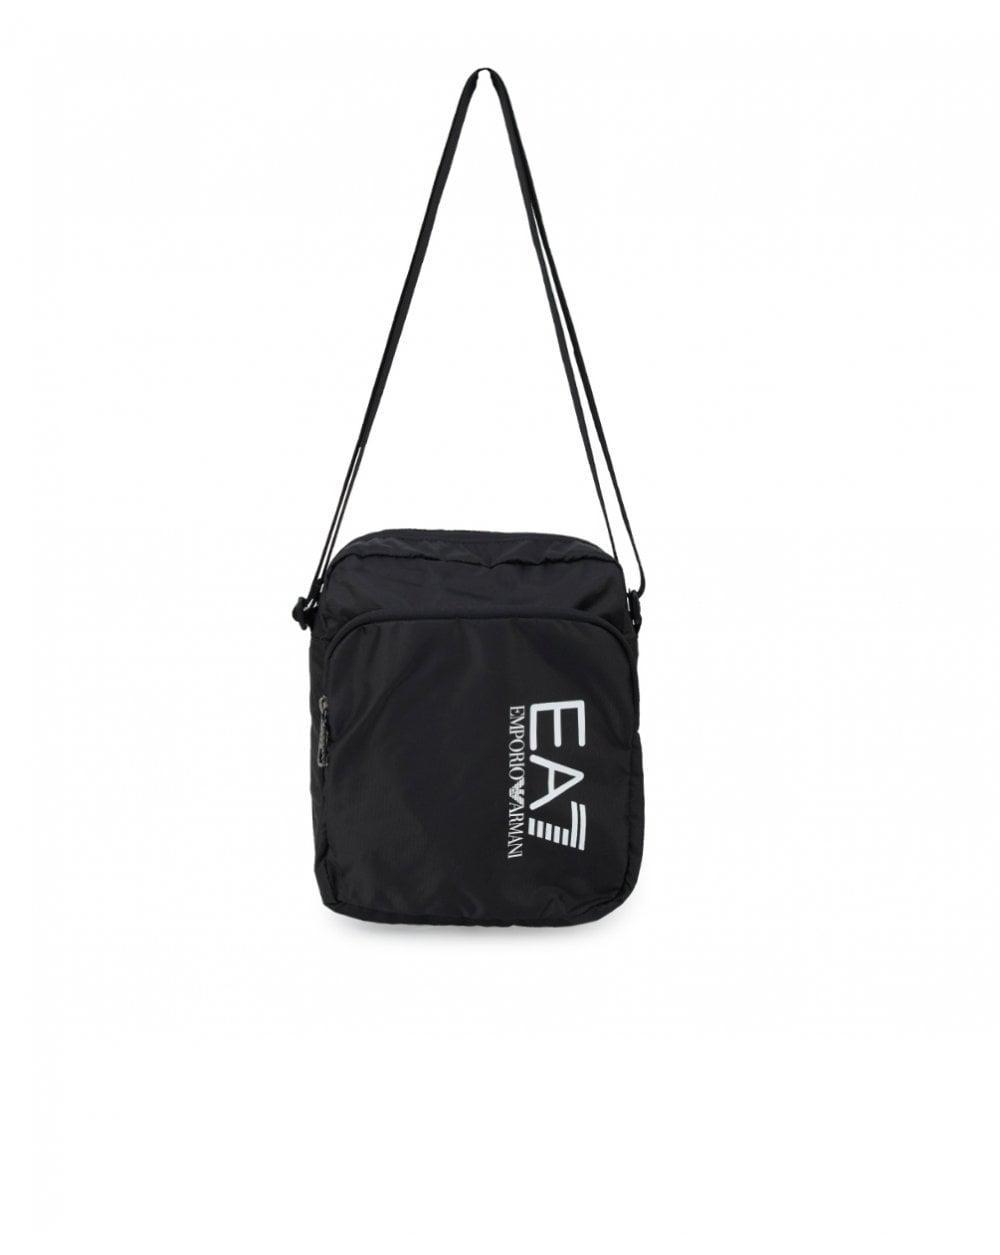 EA7 Train Prime Pouch Side Logo Large Bag in Black for Men - Lyst 5604858a7d64b